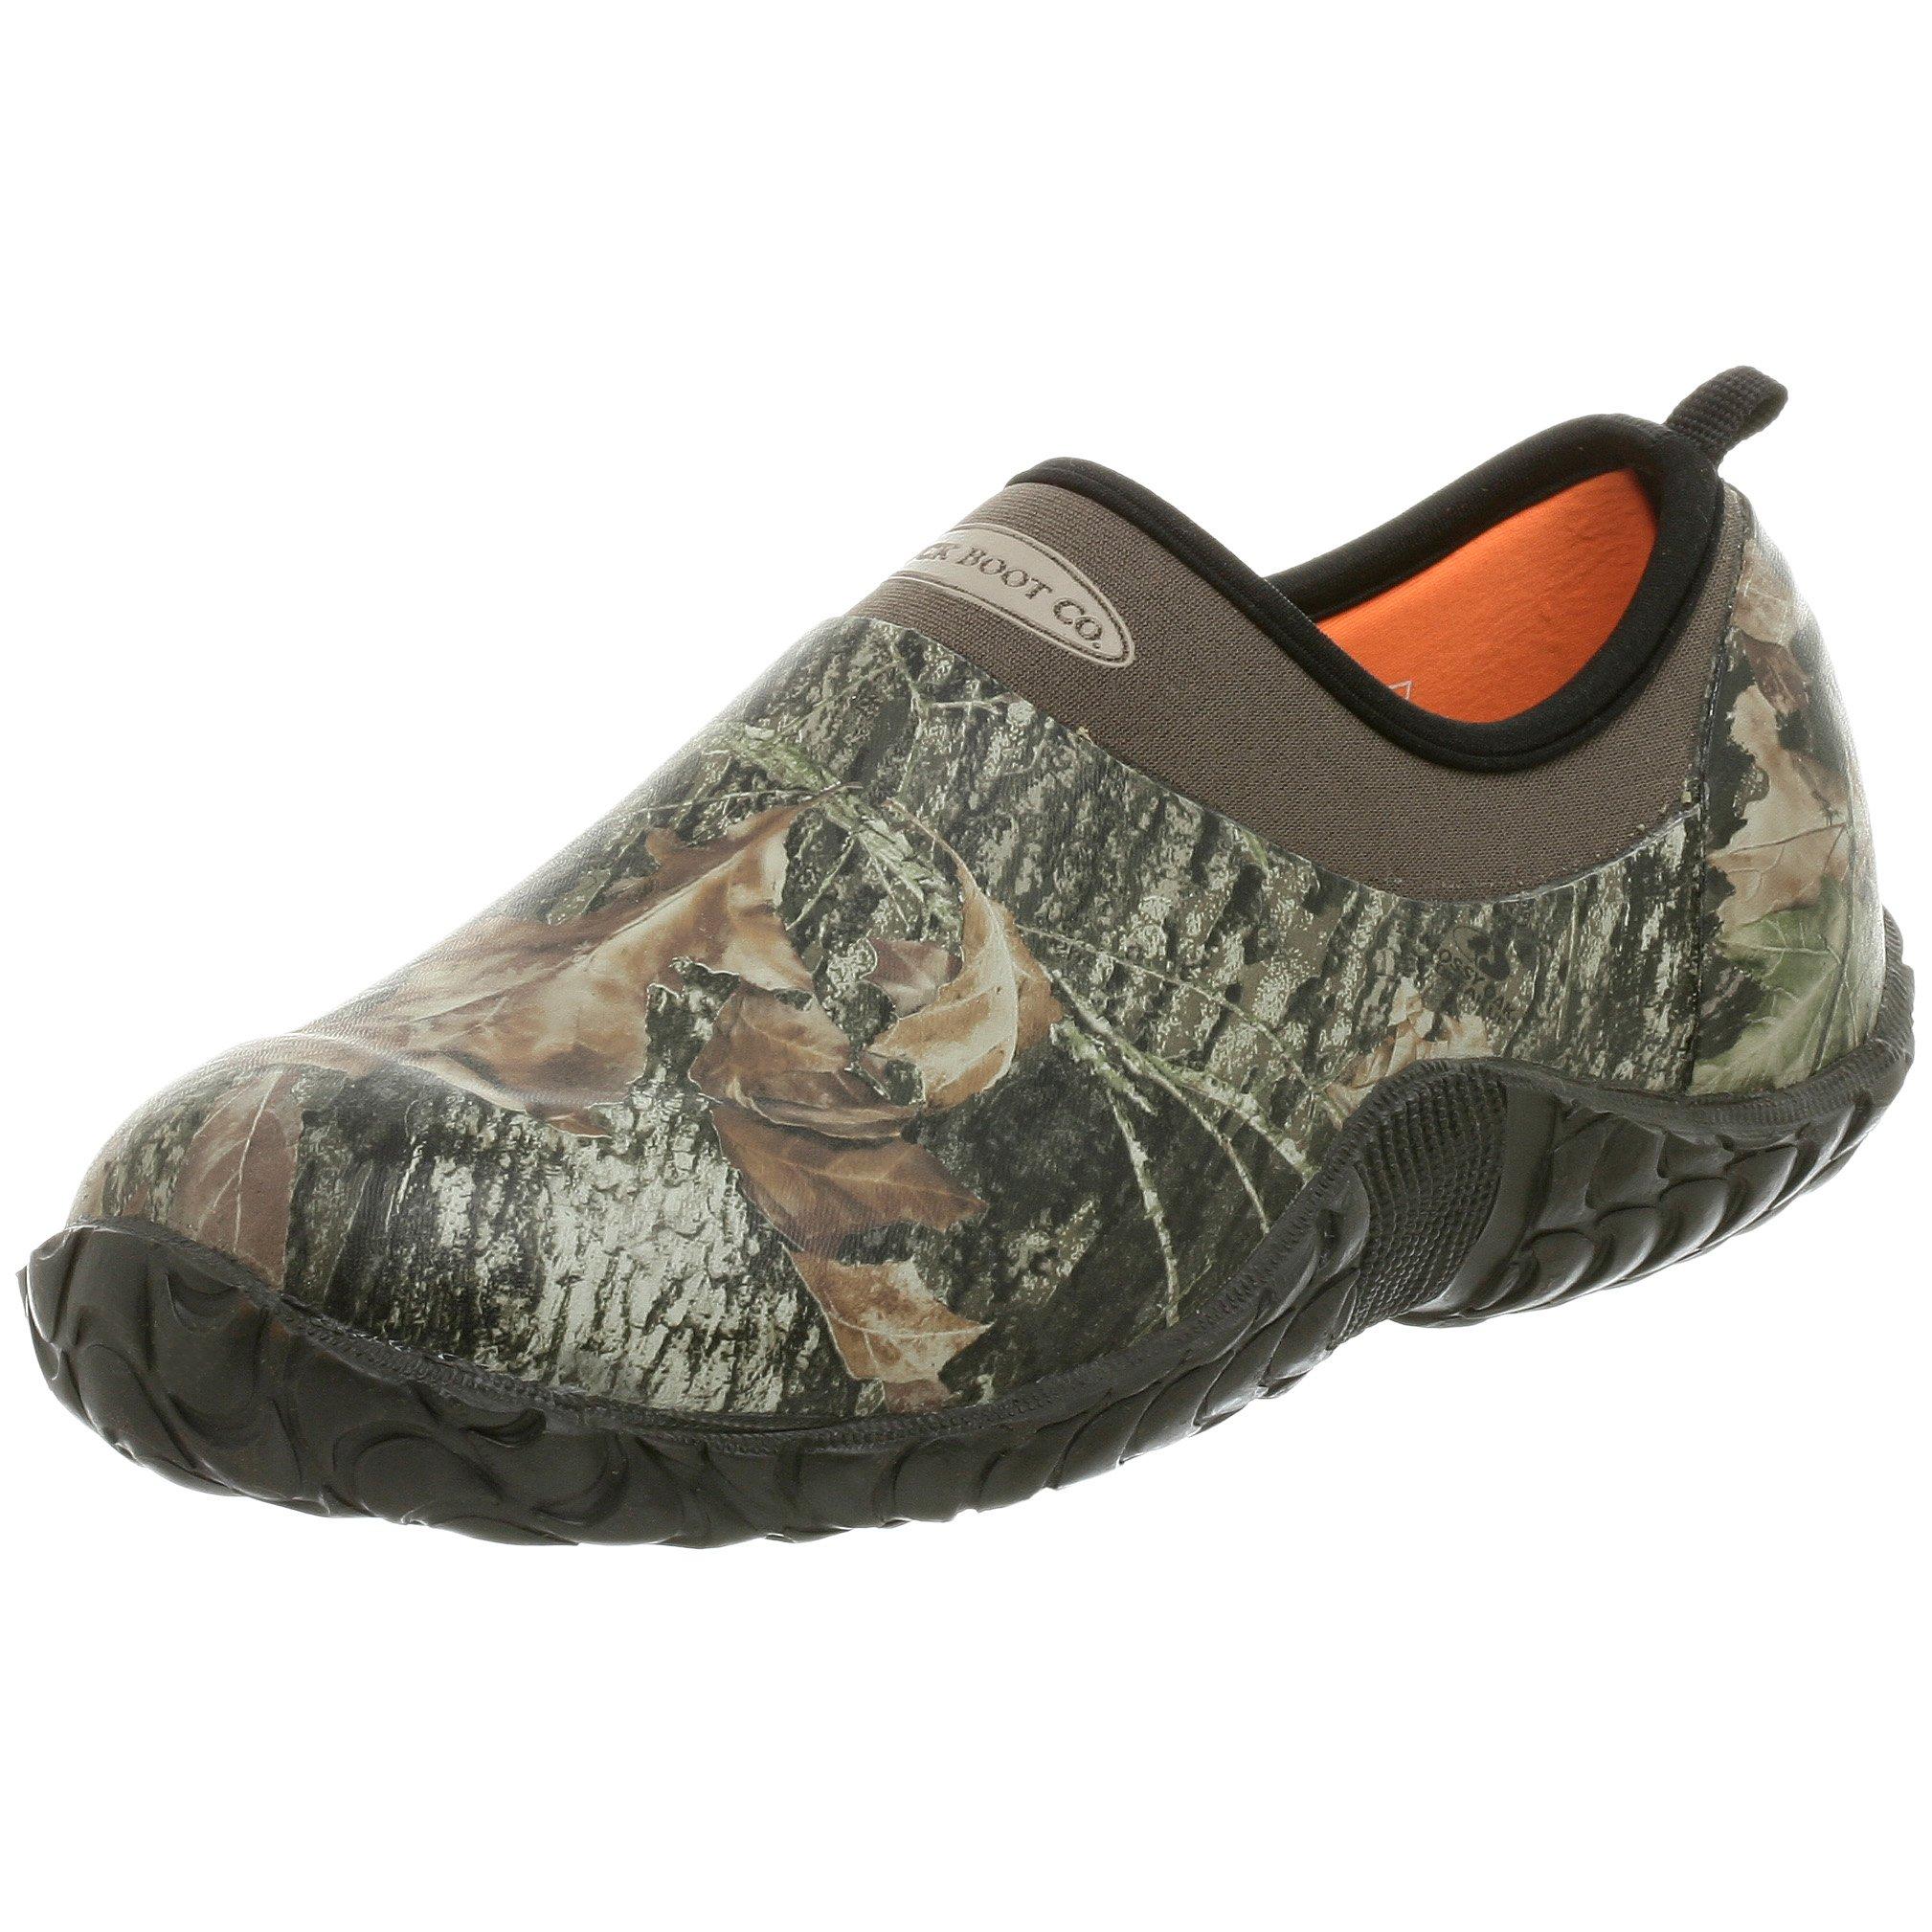 The Original MuckBoots Adult Camo Camp Shoe,Mossy Oak Break-up,8 M US Mens/9 M US Womens by Muck Boot